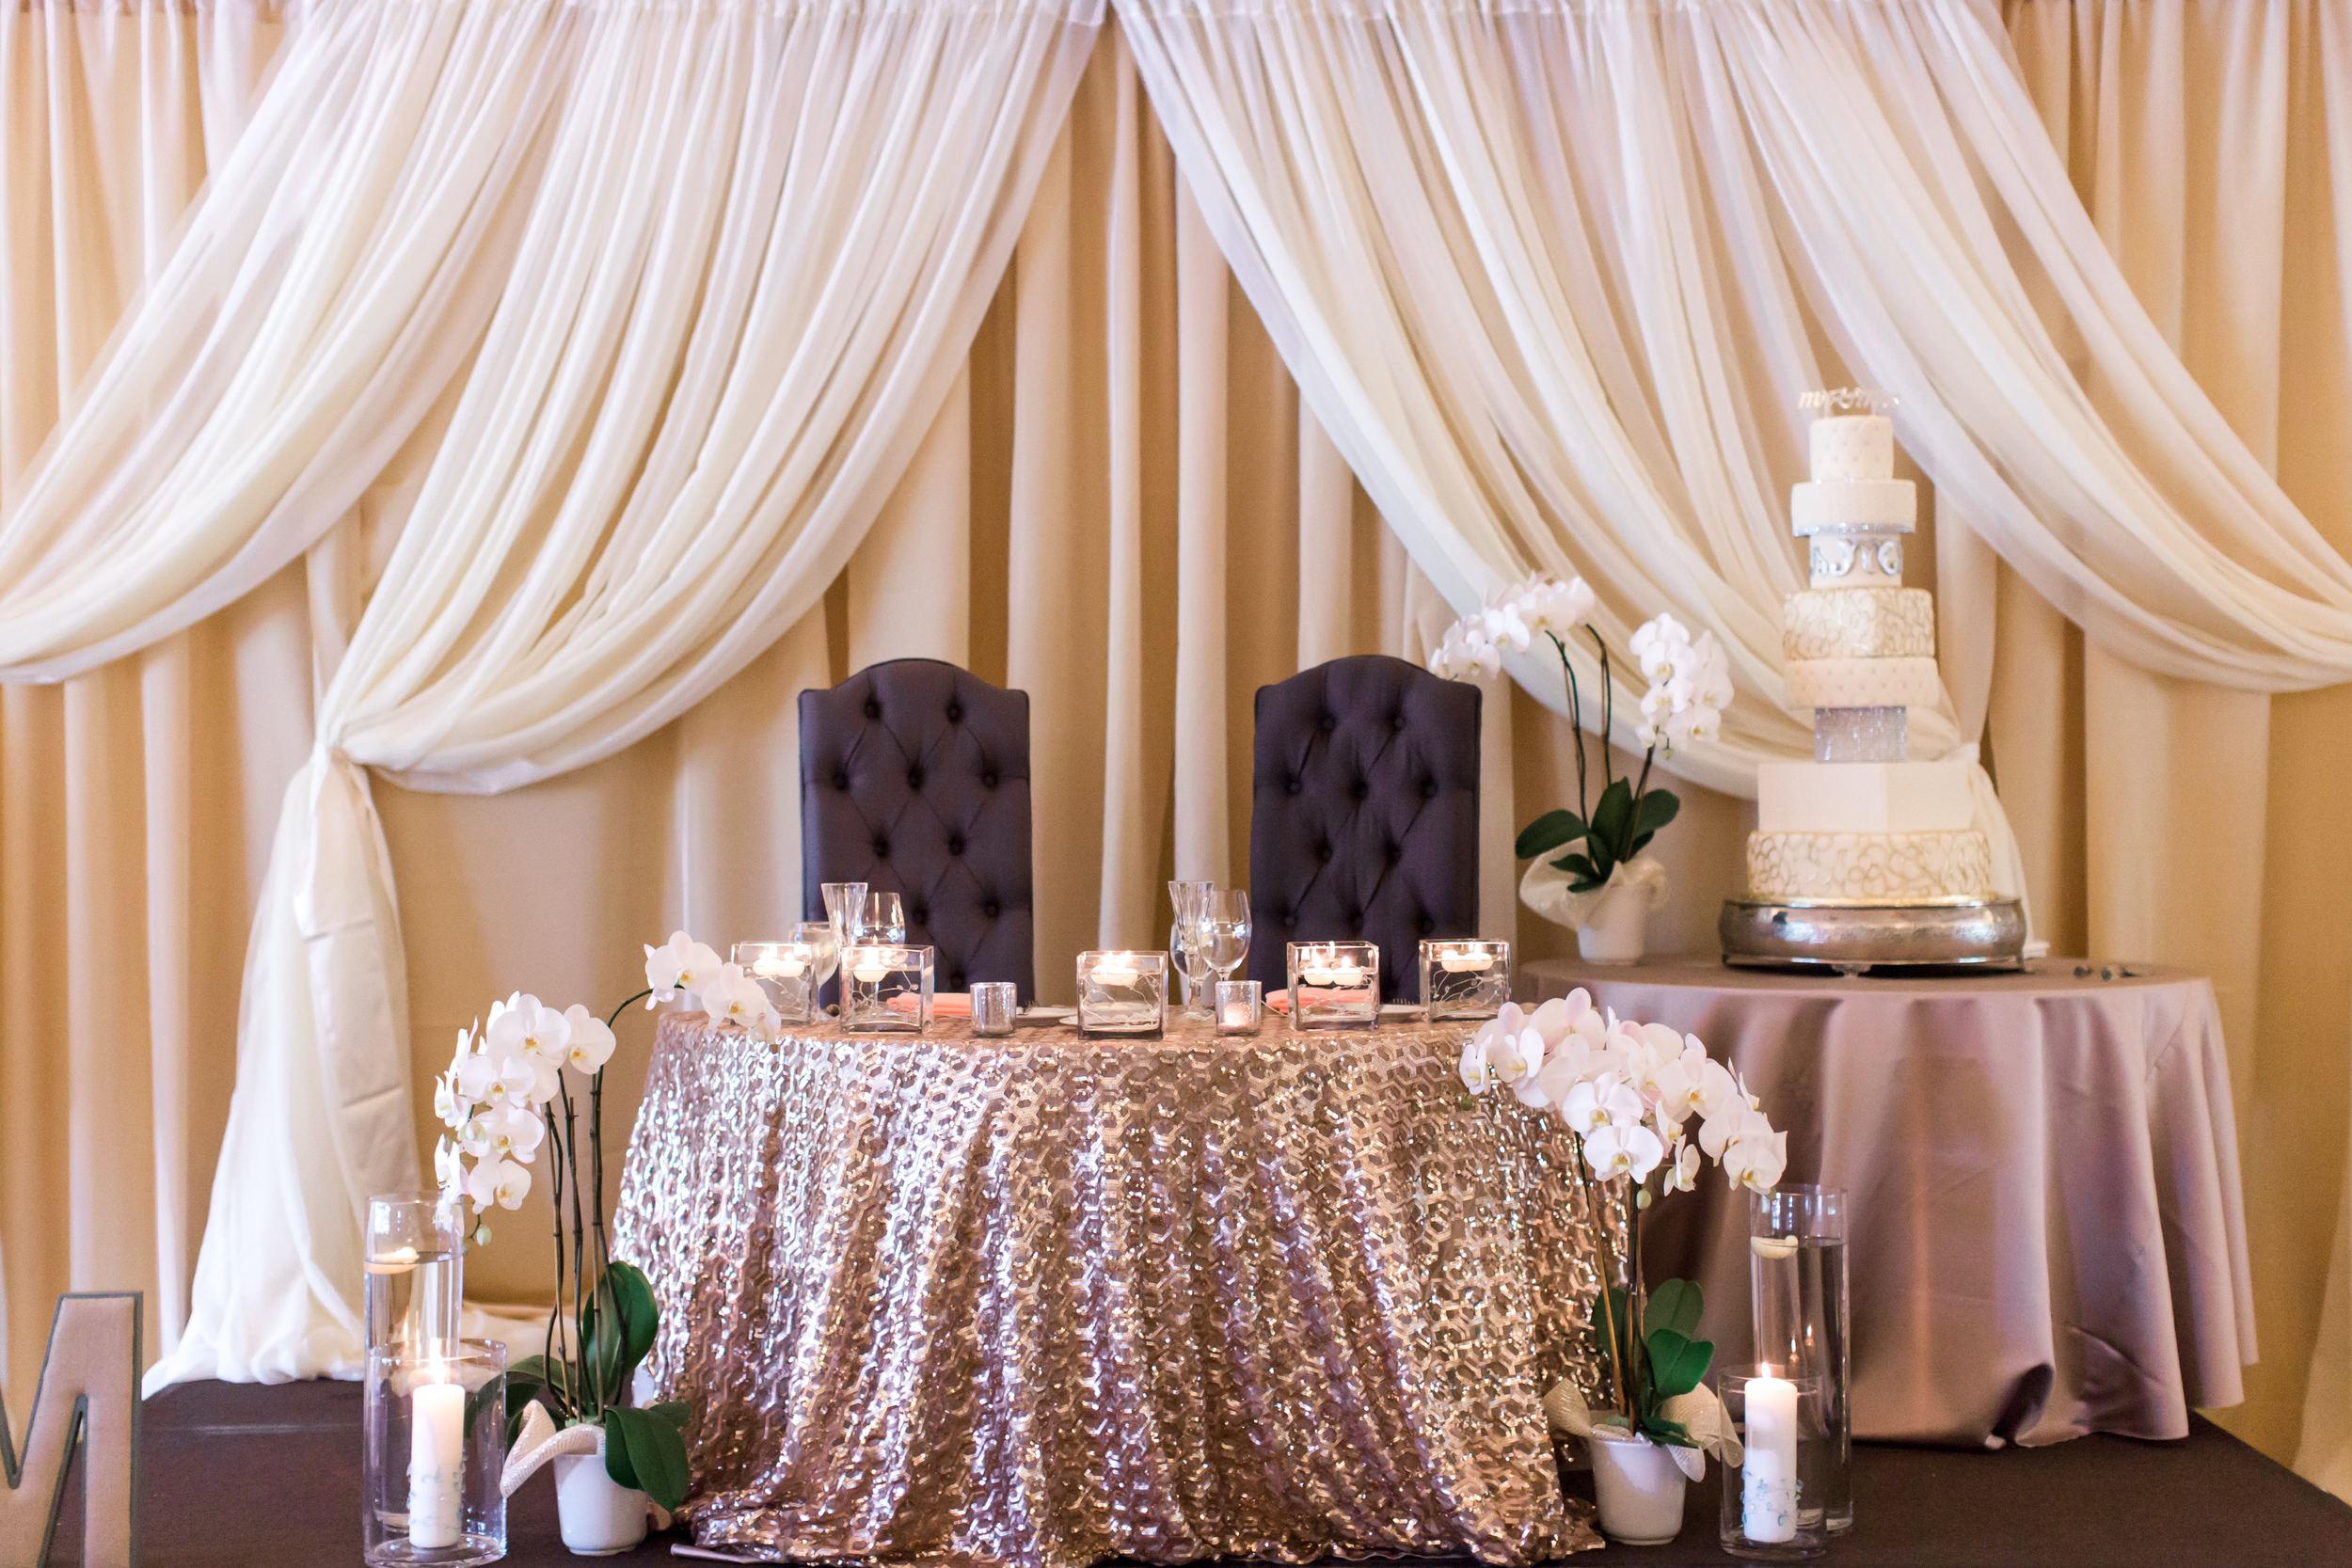 hawaiian-inspired-wedding-at-blackhawk-country-club-2740.jpg